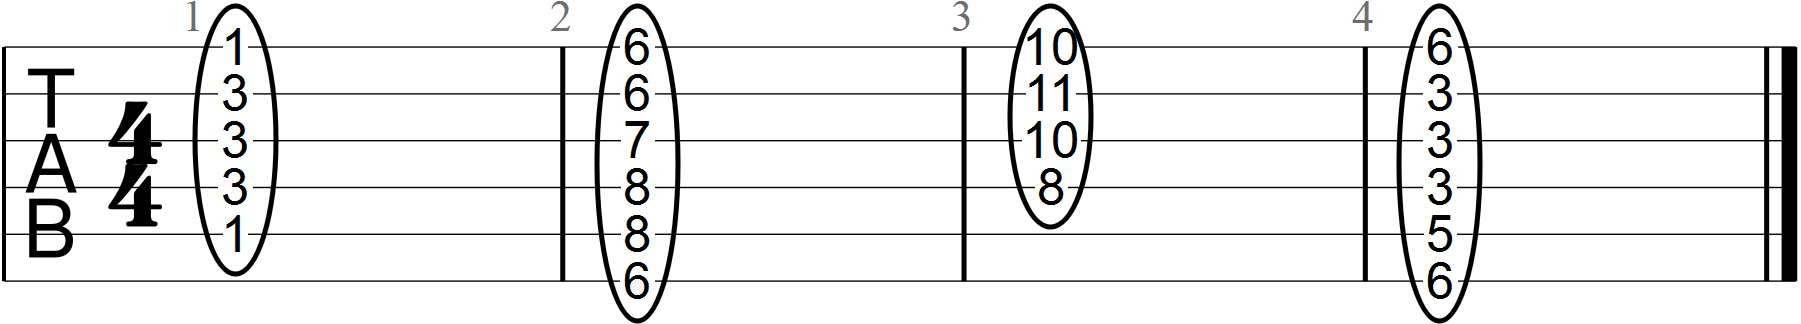 B Flat Chord Primer for Guitar Players | Guitar Chalk